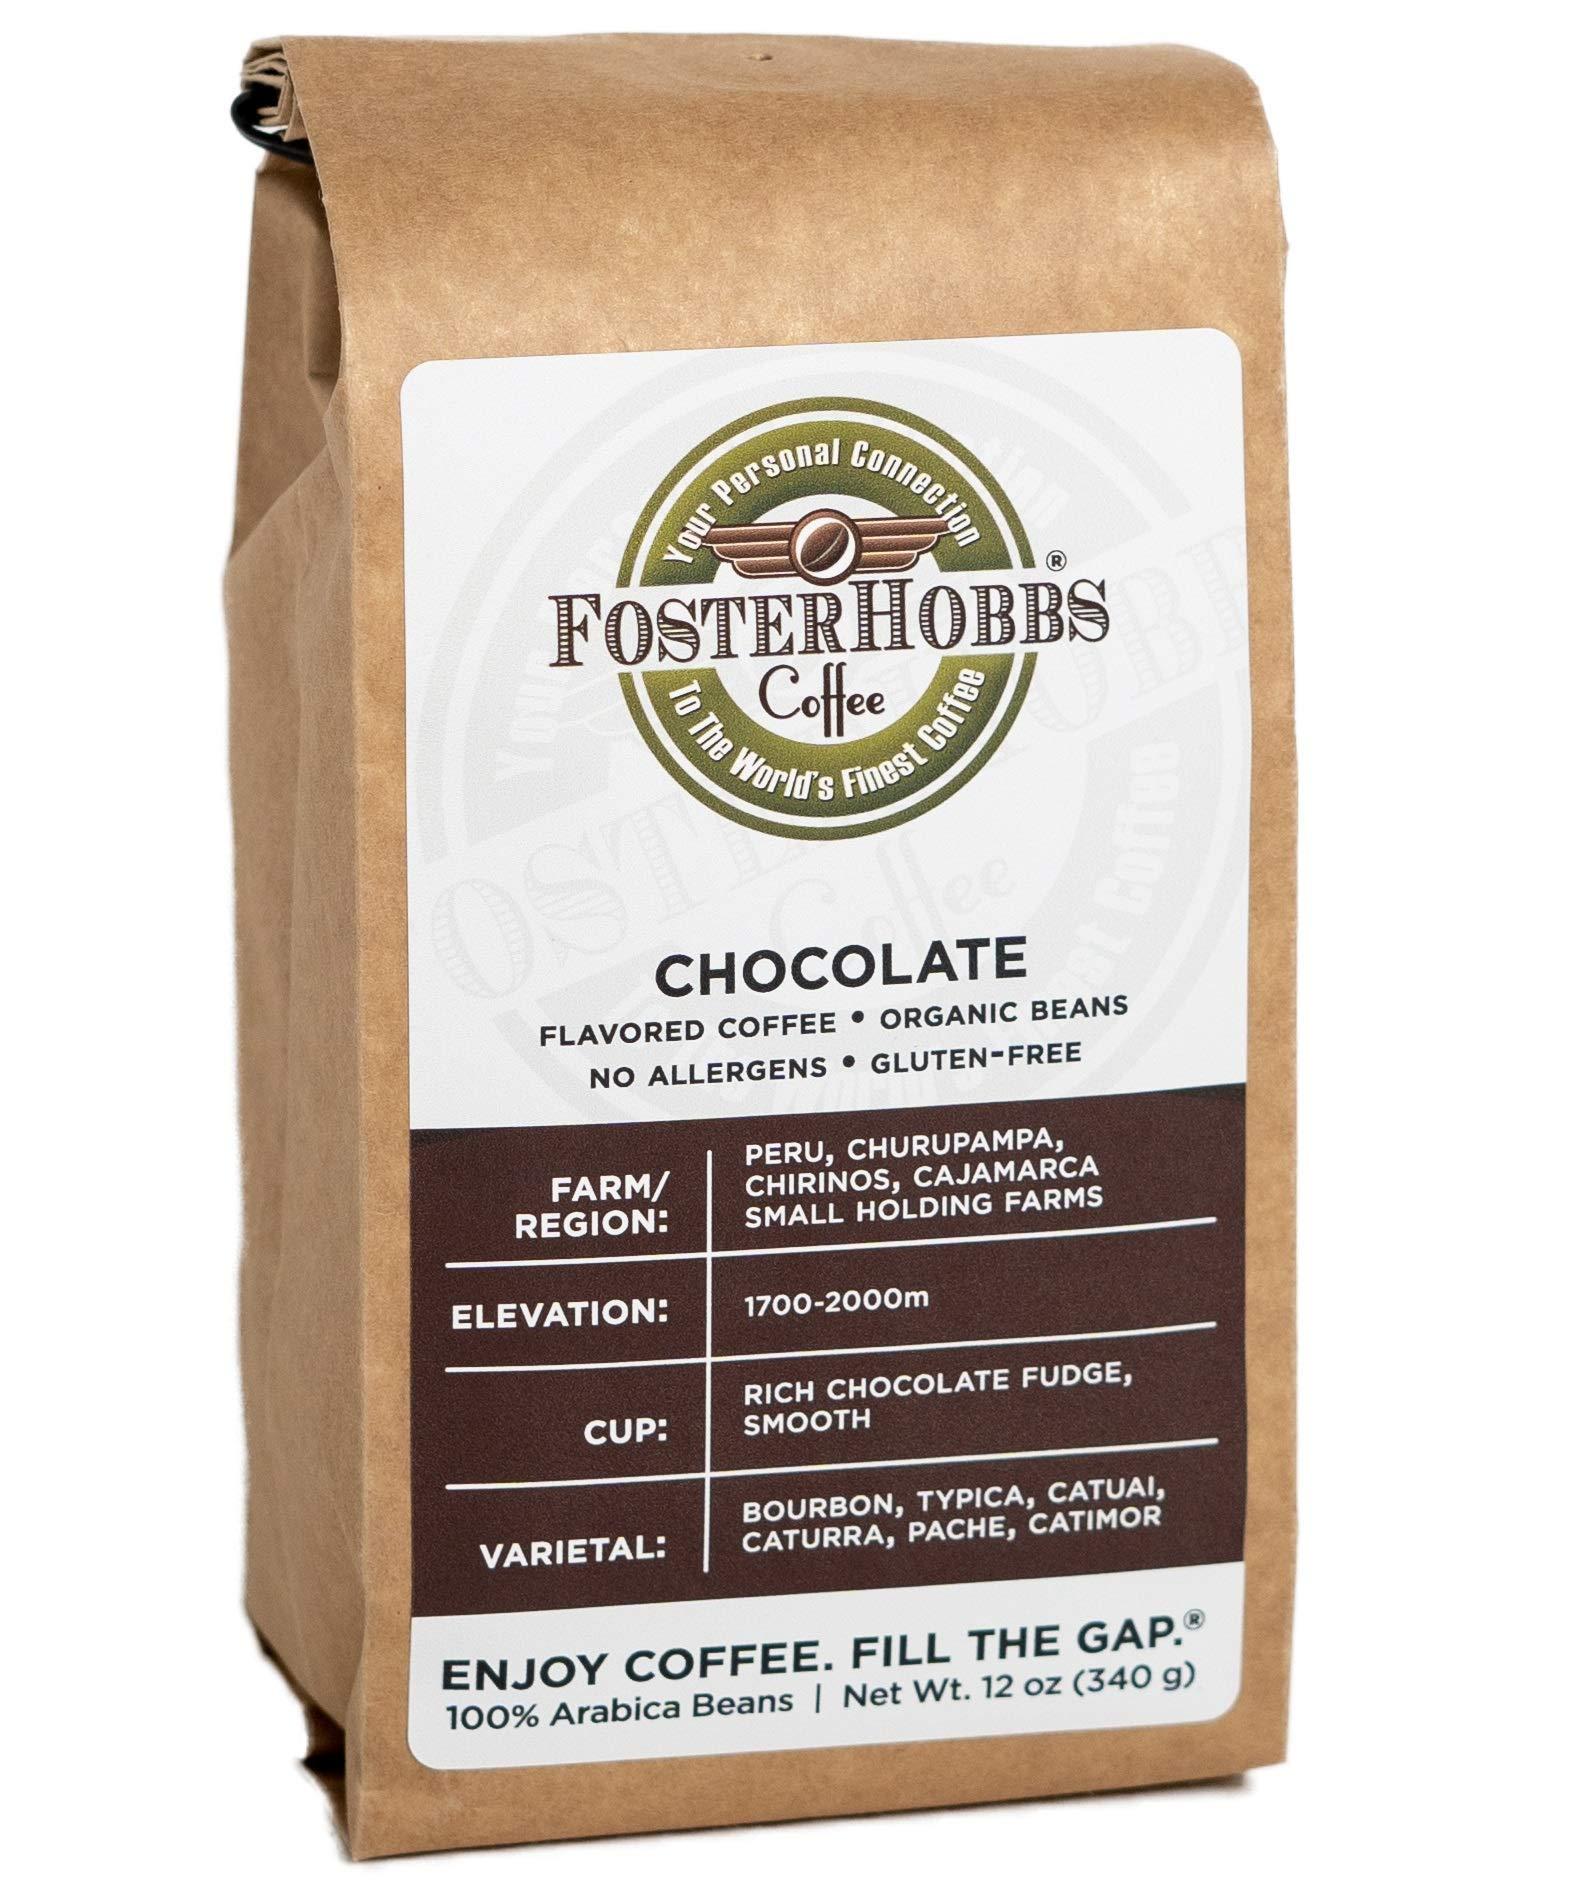 FOSTERHOBBS COFFEE - Roasted Whole Bean Coffee, Small Batch Specialty Grade (Chocolate)